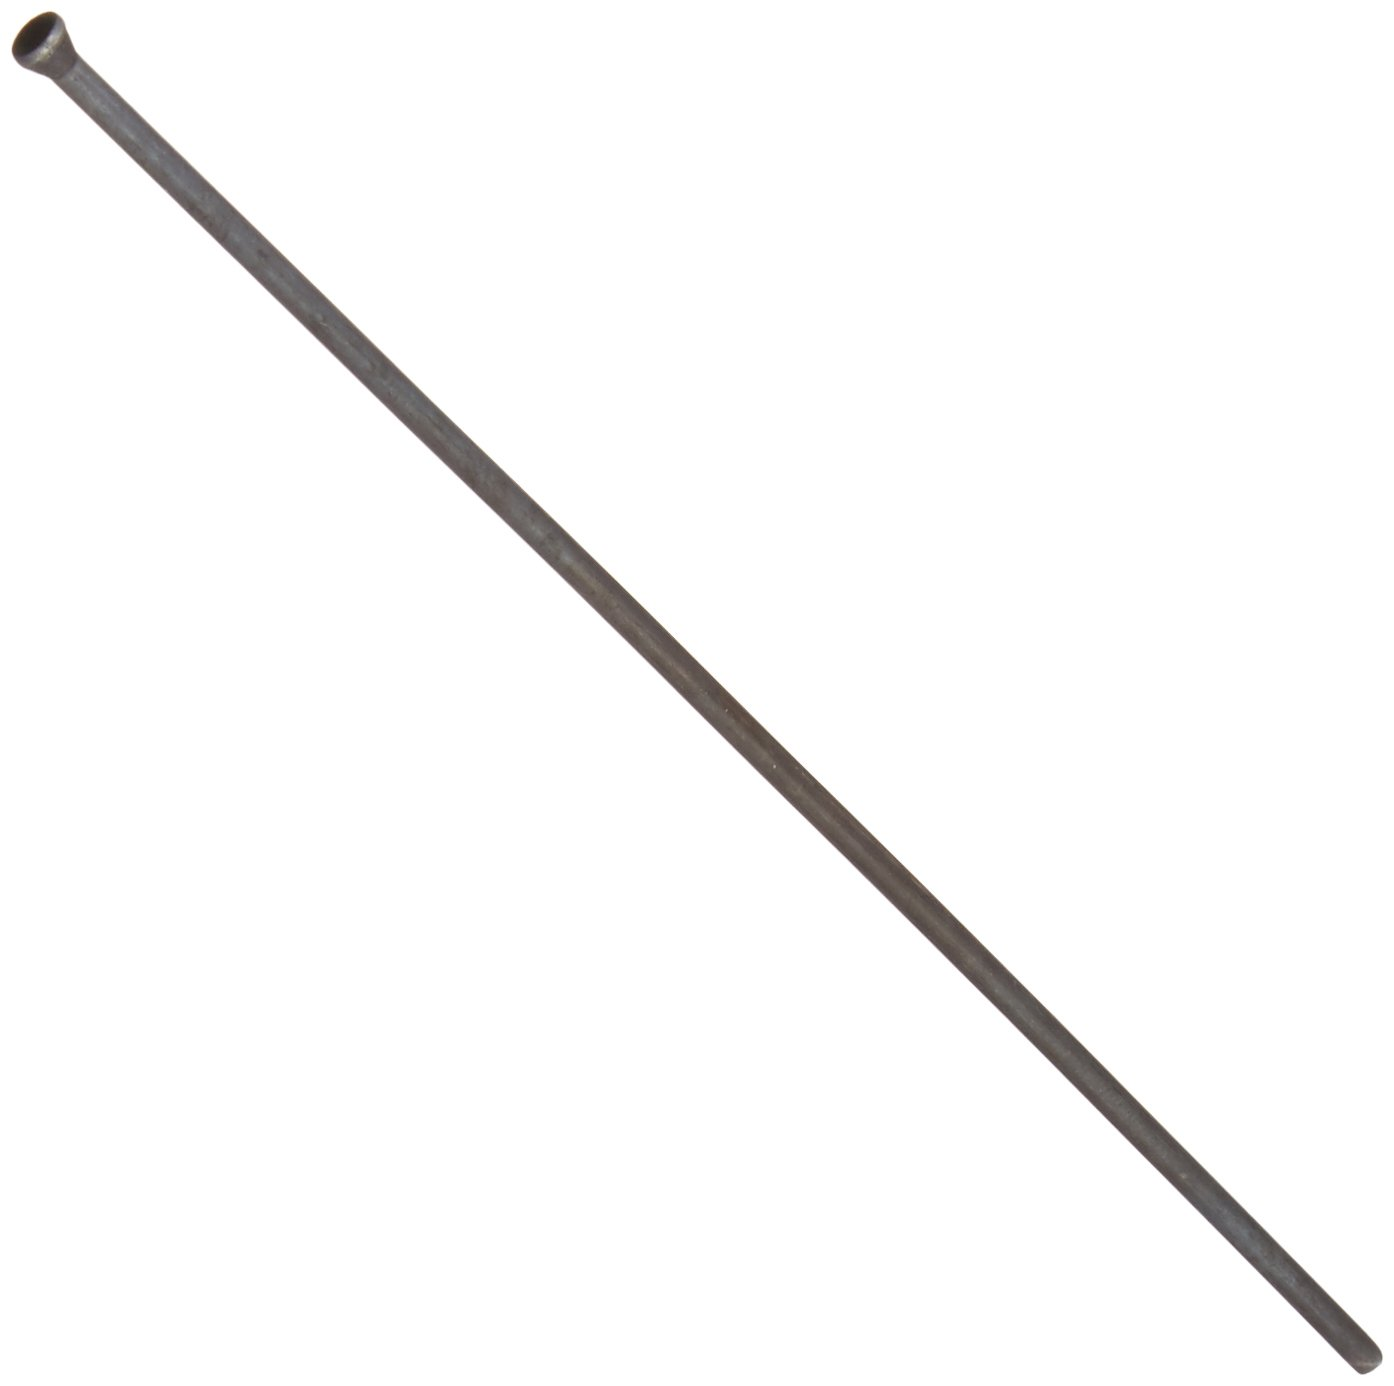 Ingersoll-Rand NS11-122-19 Steel Needle Set (19 piece)